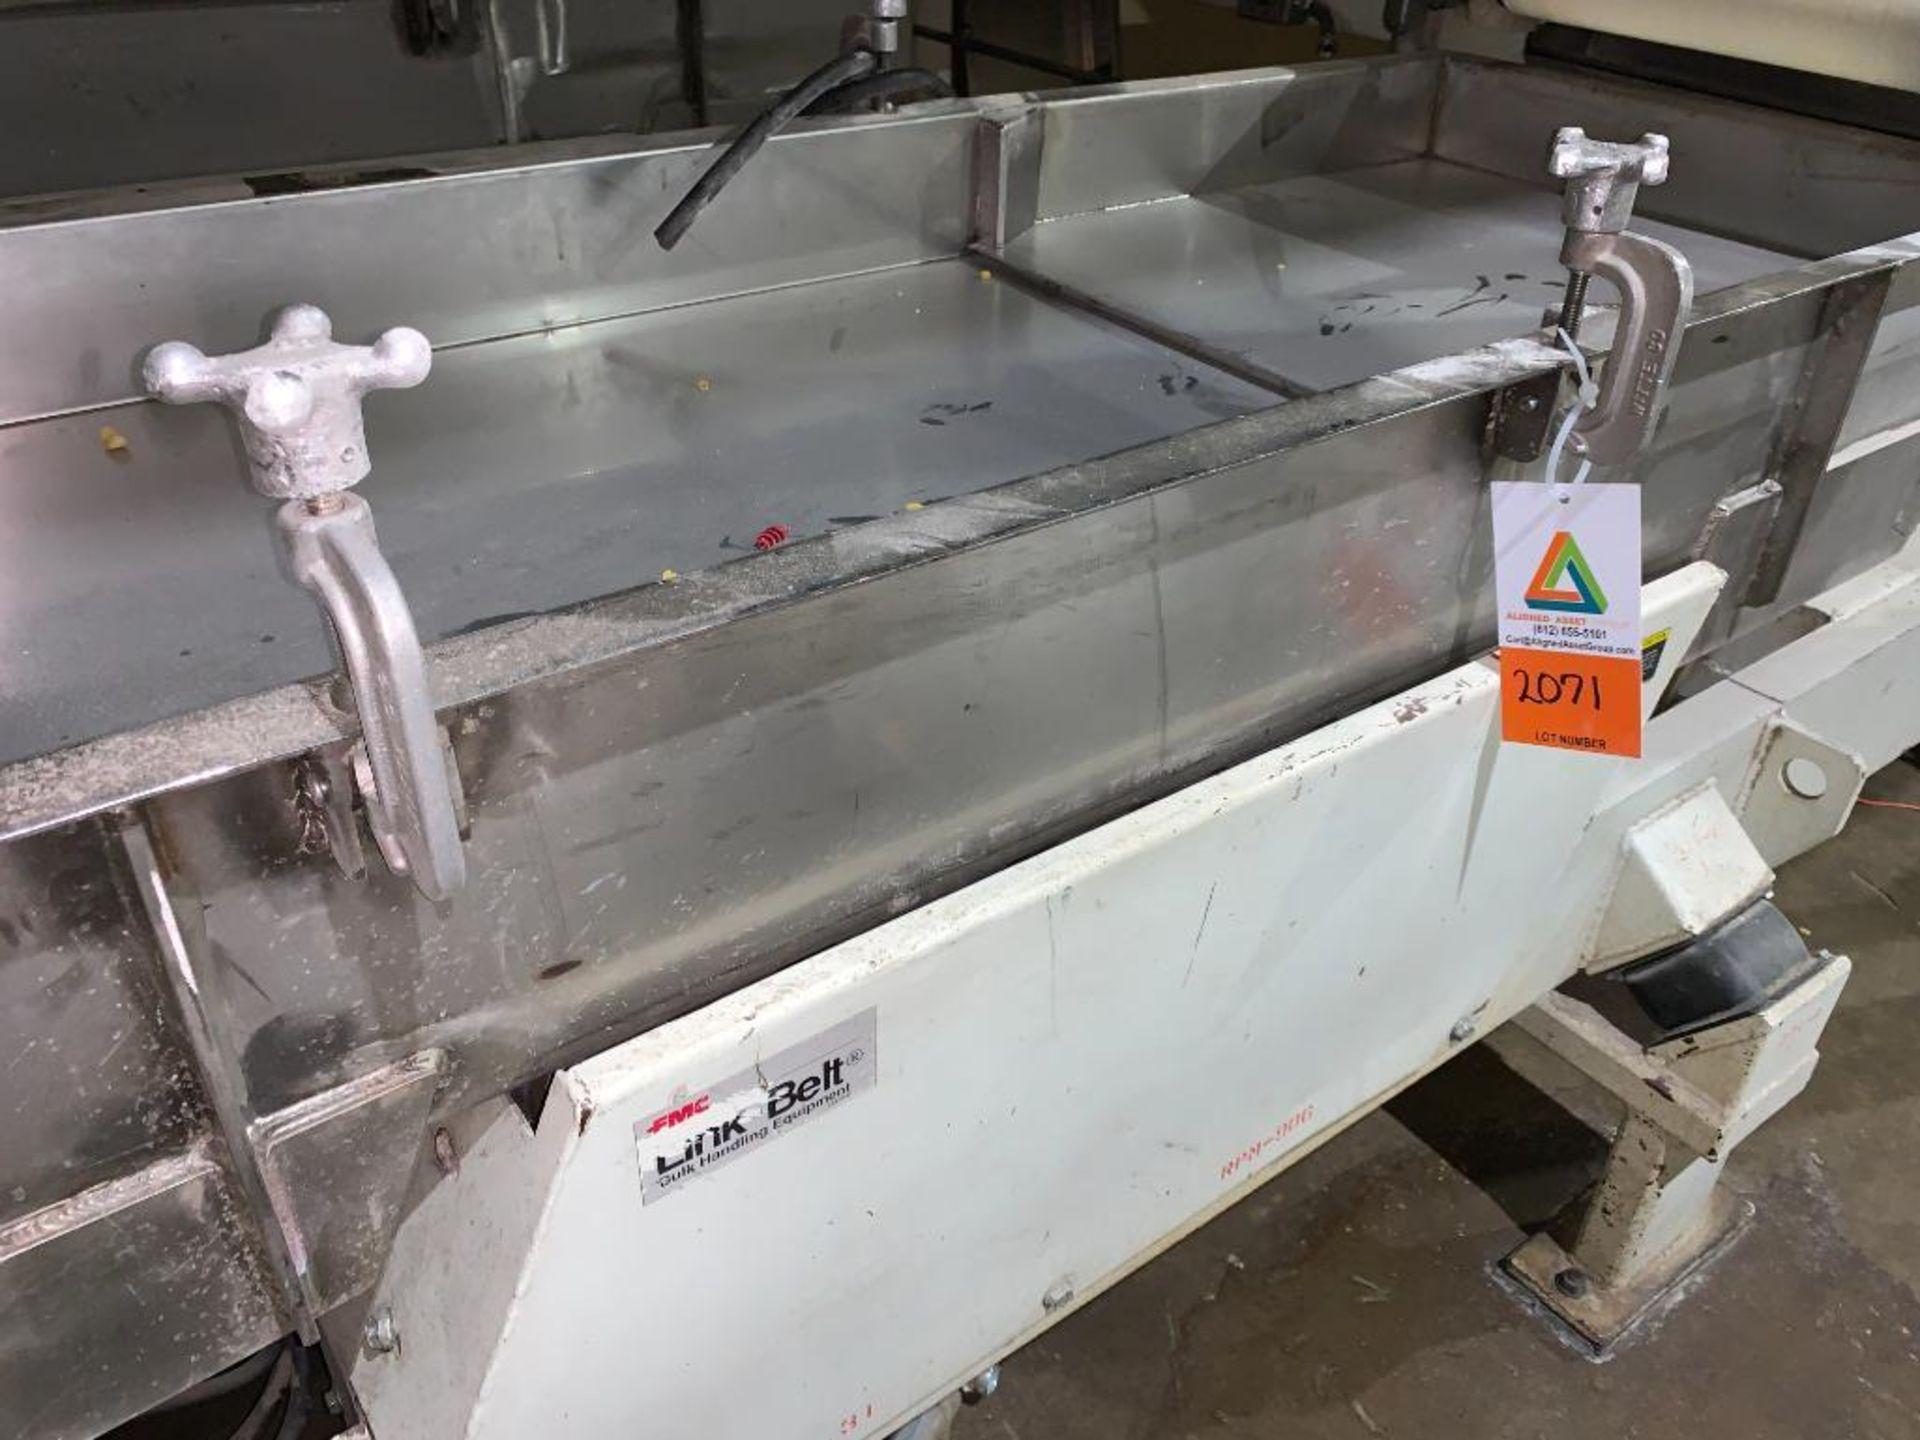 1993 Link-Belt stainless steel vibratory scalping conveyor - Image 2 of 10